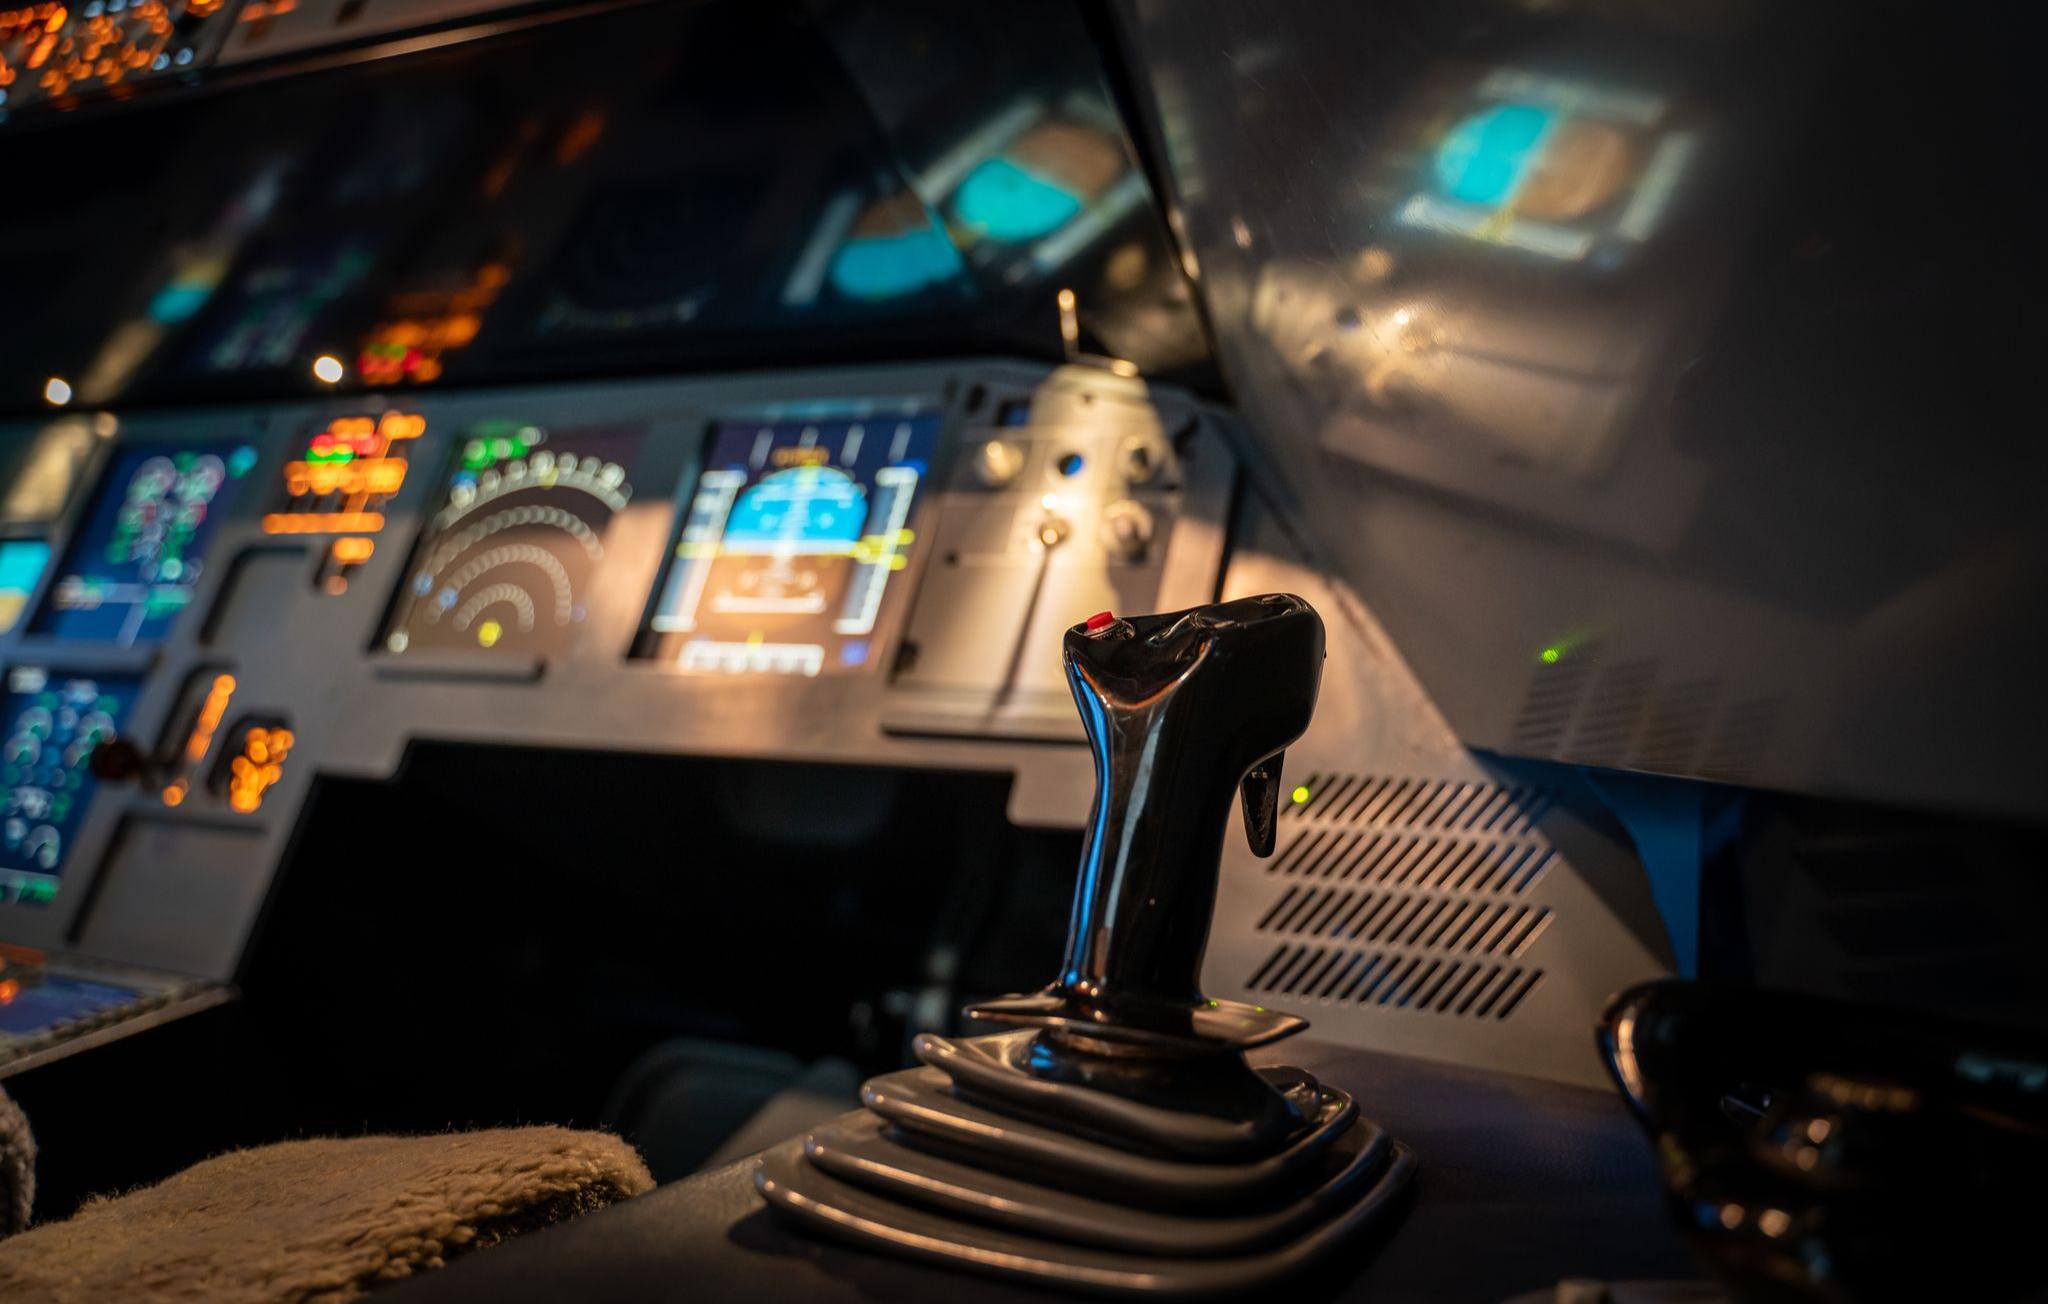 joystick-flugsimulator-frankfurt-am-main